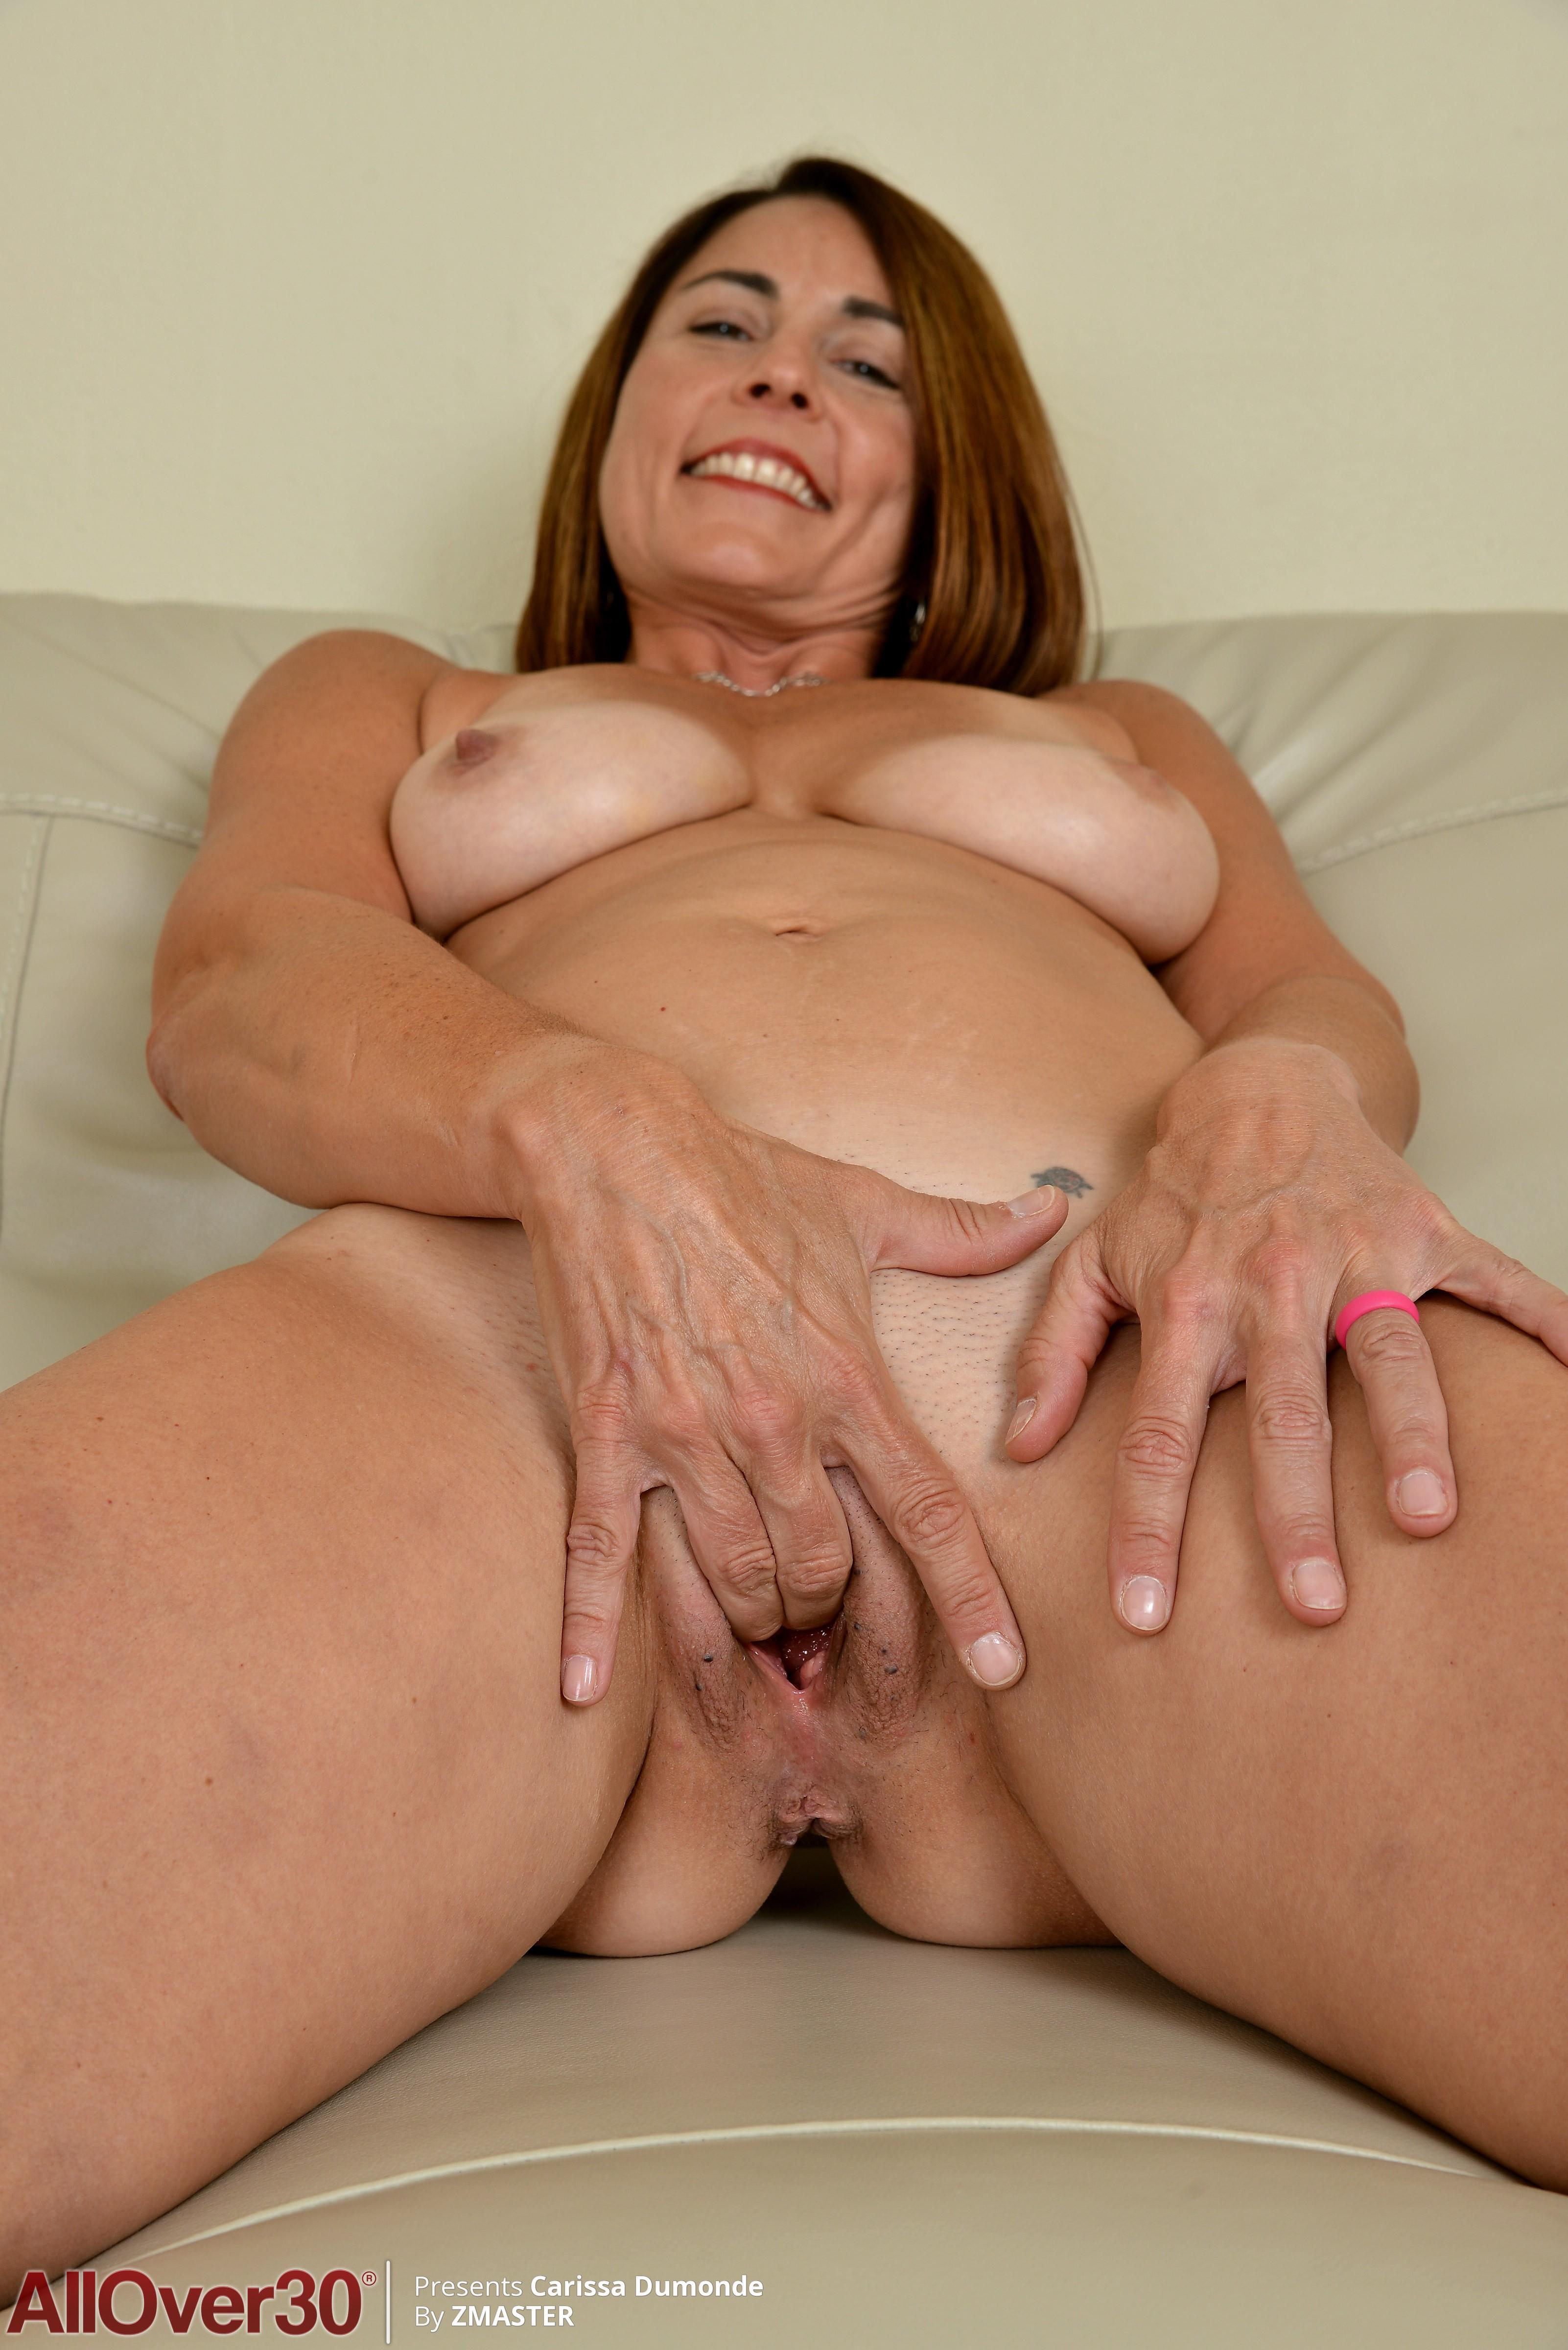 Chiropractor girl nude naked